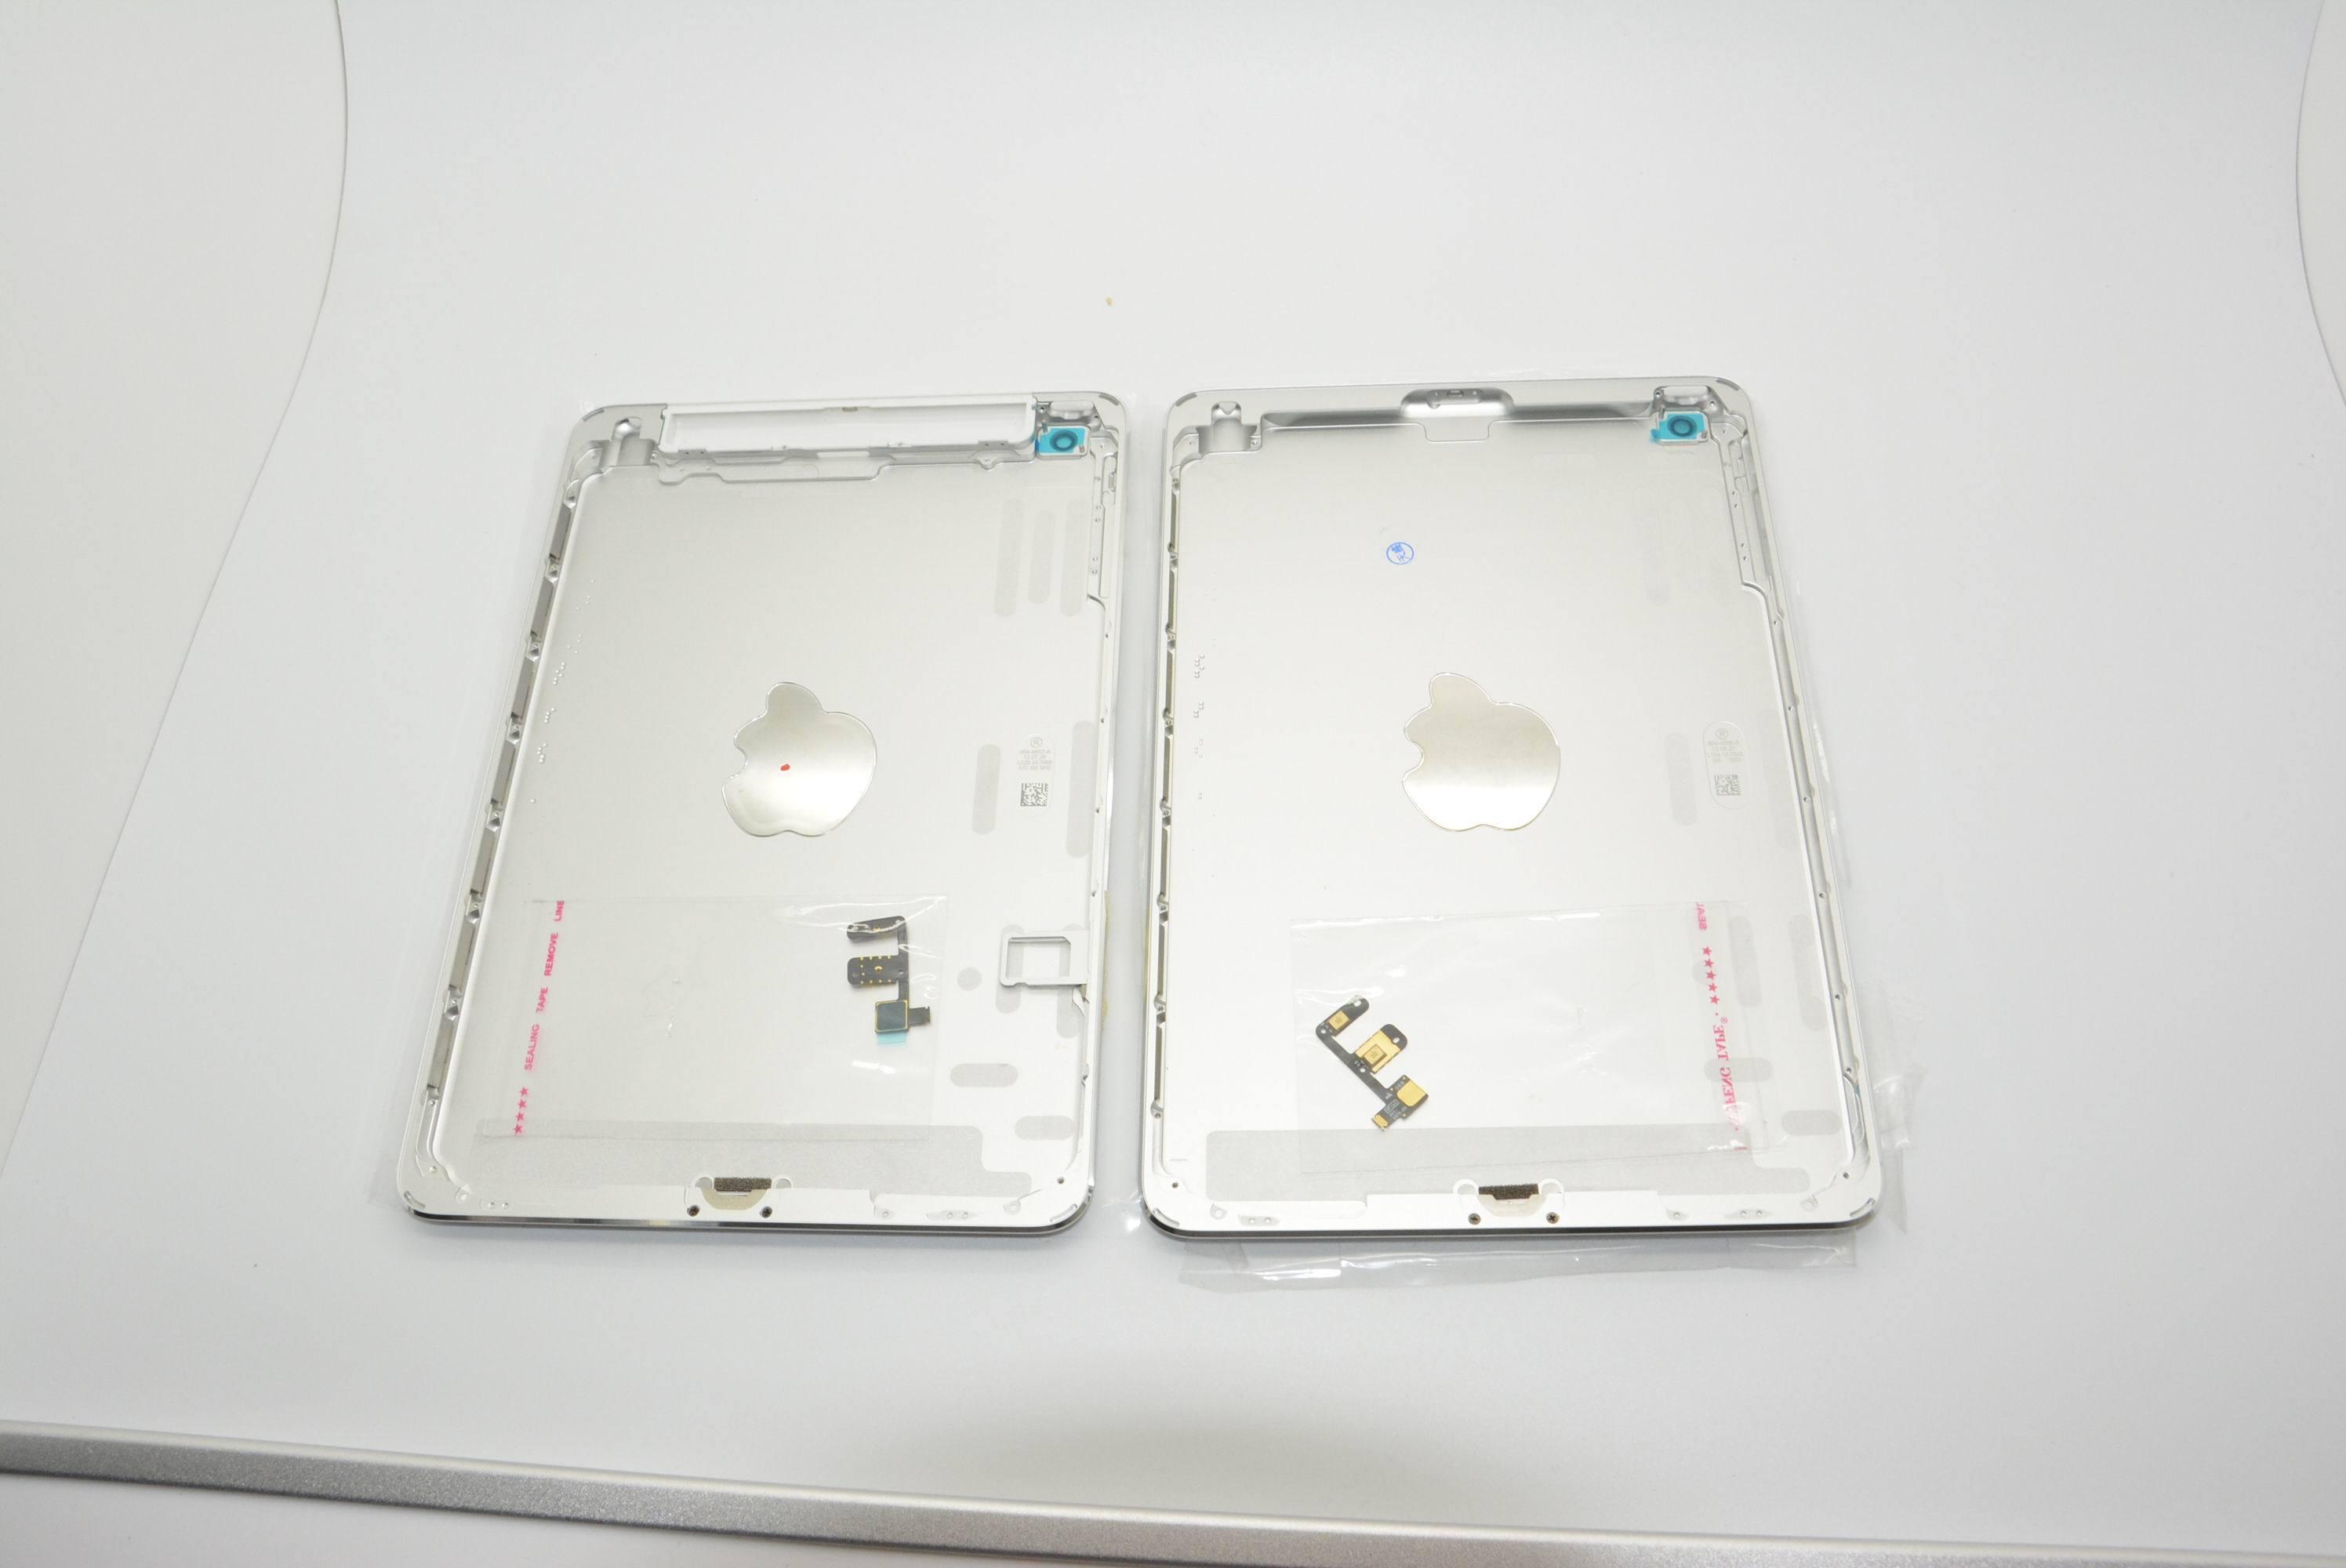 ipad 5 coques gris sideral argent - iPad 5 gris sidéral & argent : photos des coques